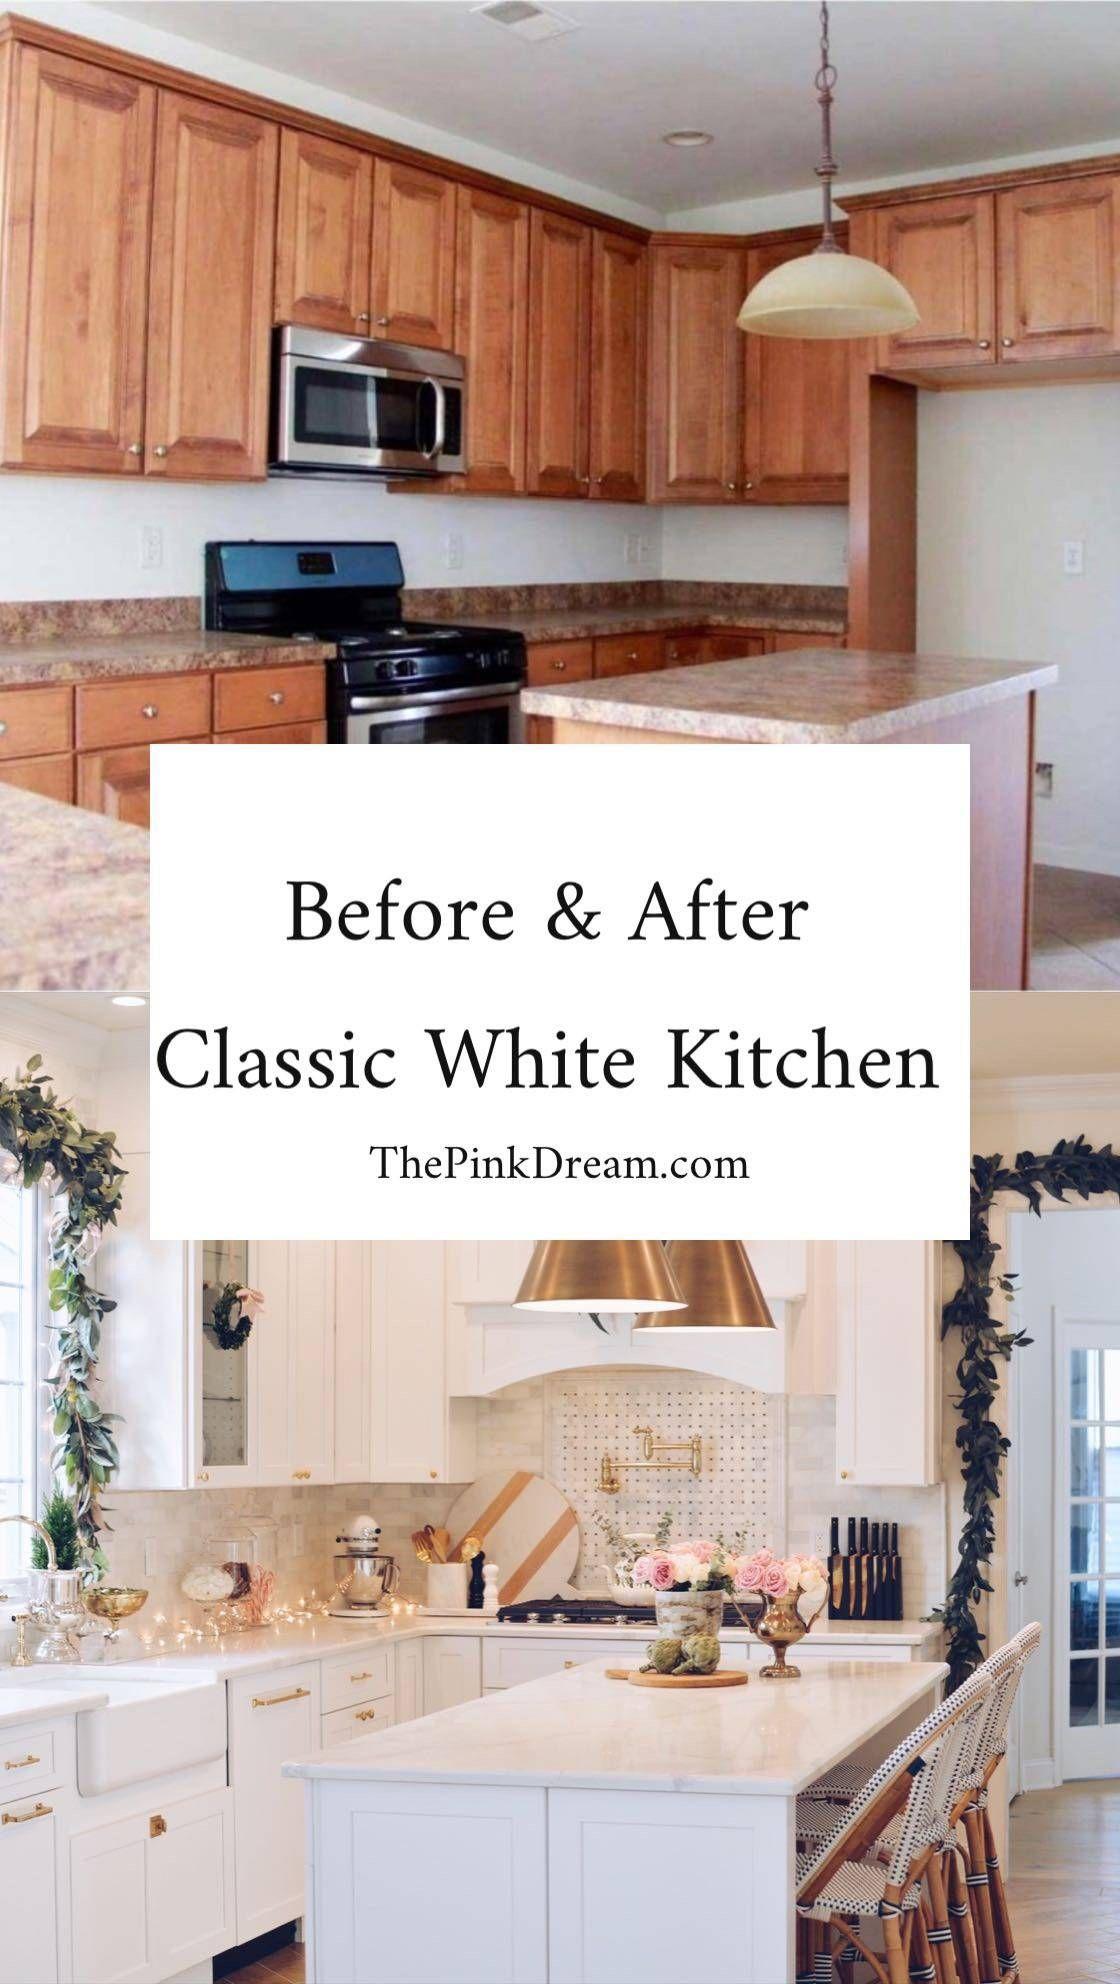 Diy Kitchen Renovation A Classic White Kitchen Remodel Kitchen Renovation Cost Classic White Kitchen Full Kitchen Remodel